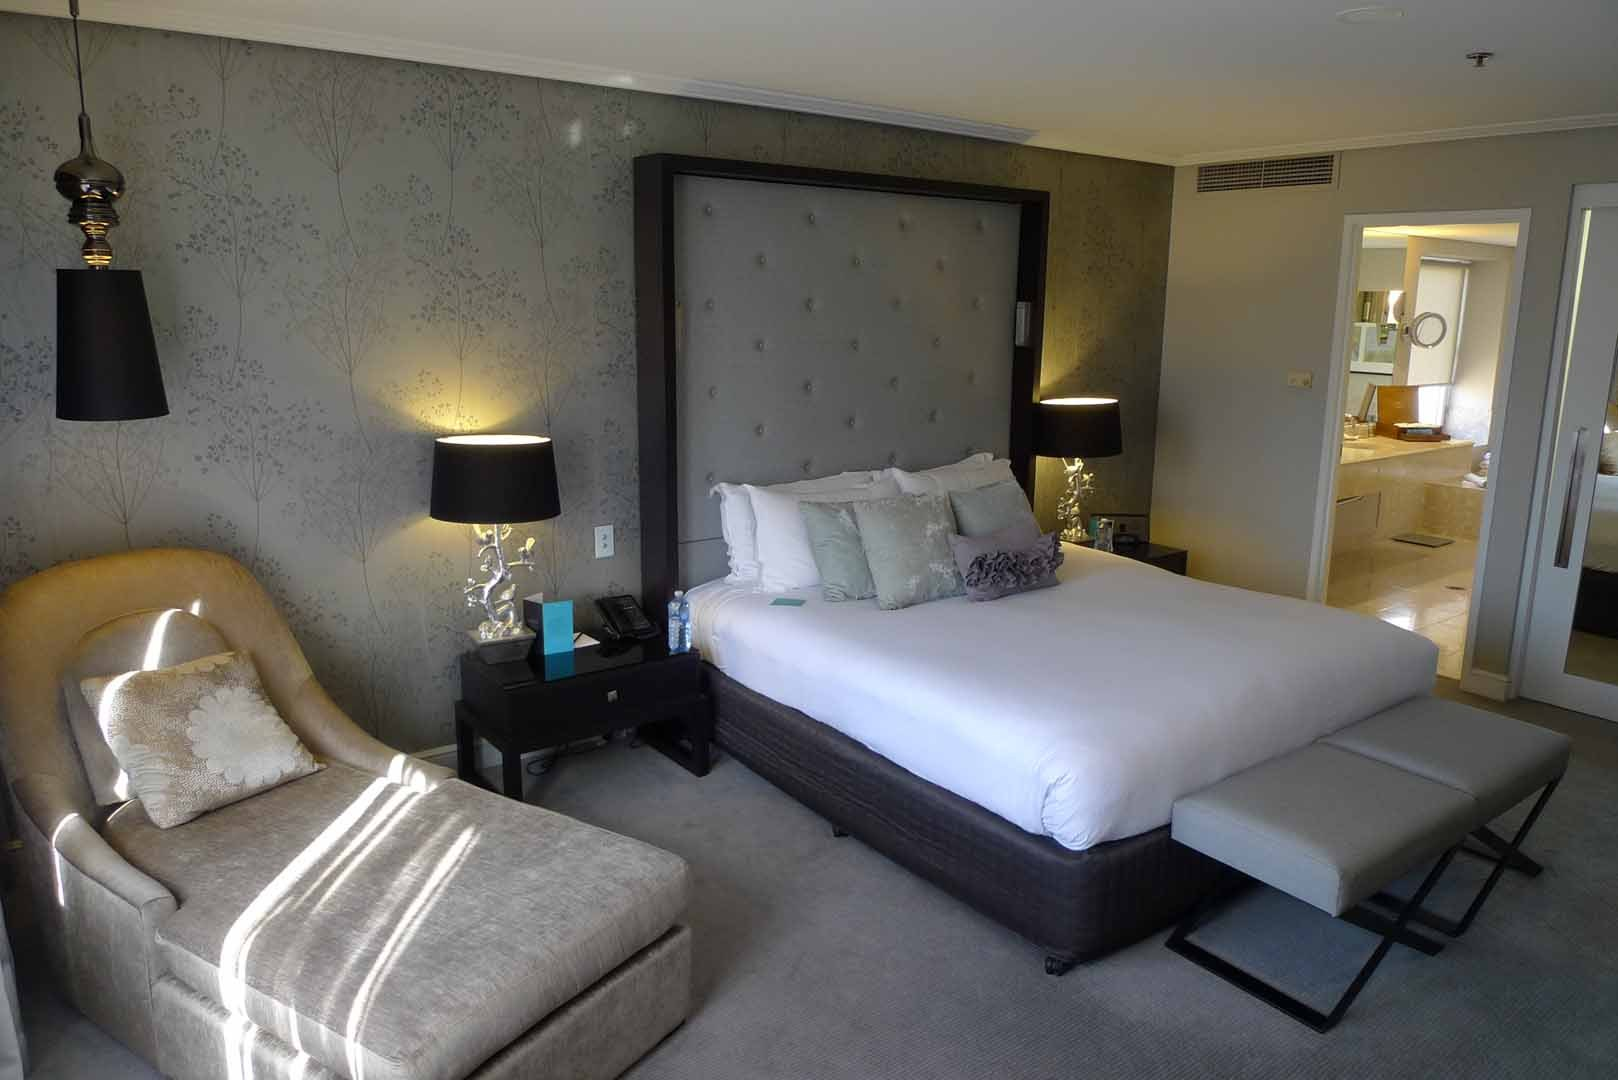 Brisbane_Hotels_Slideshow_003